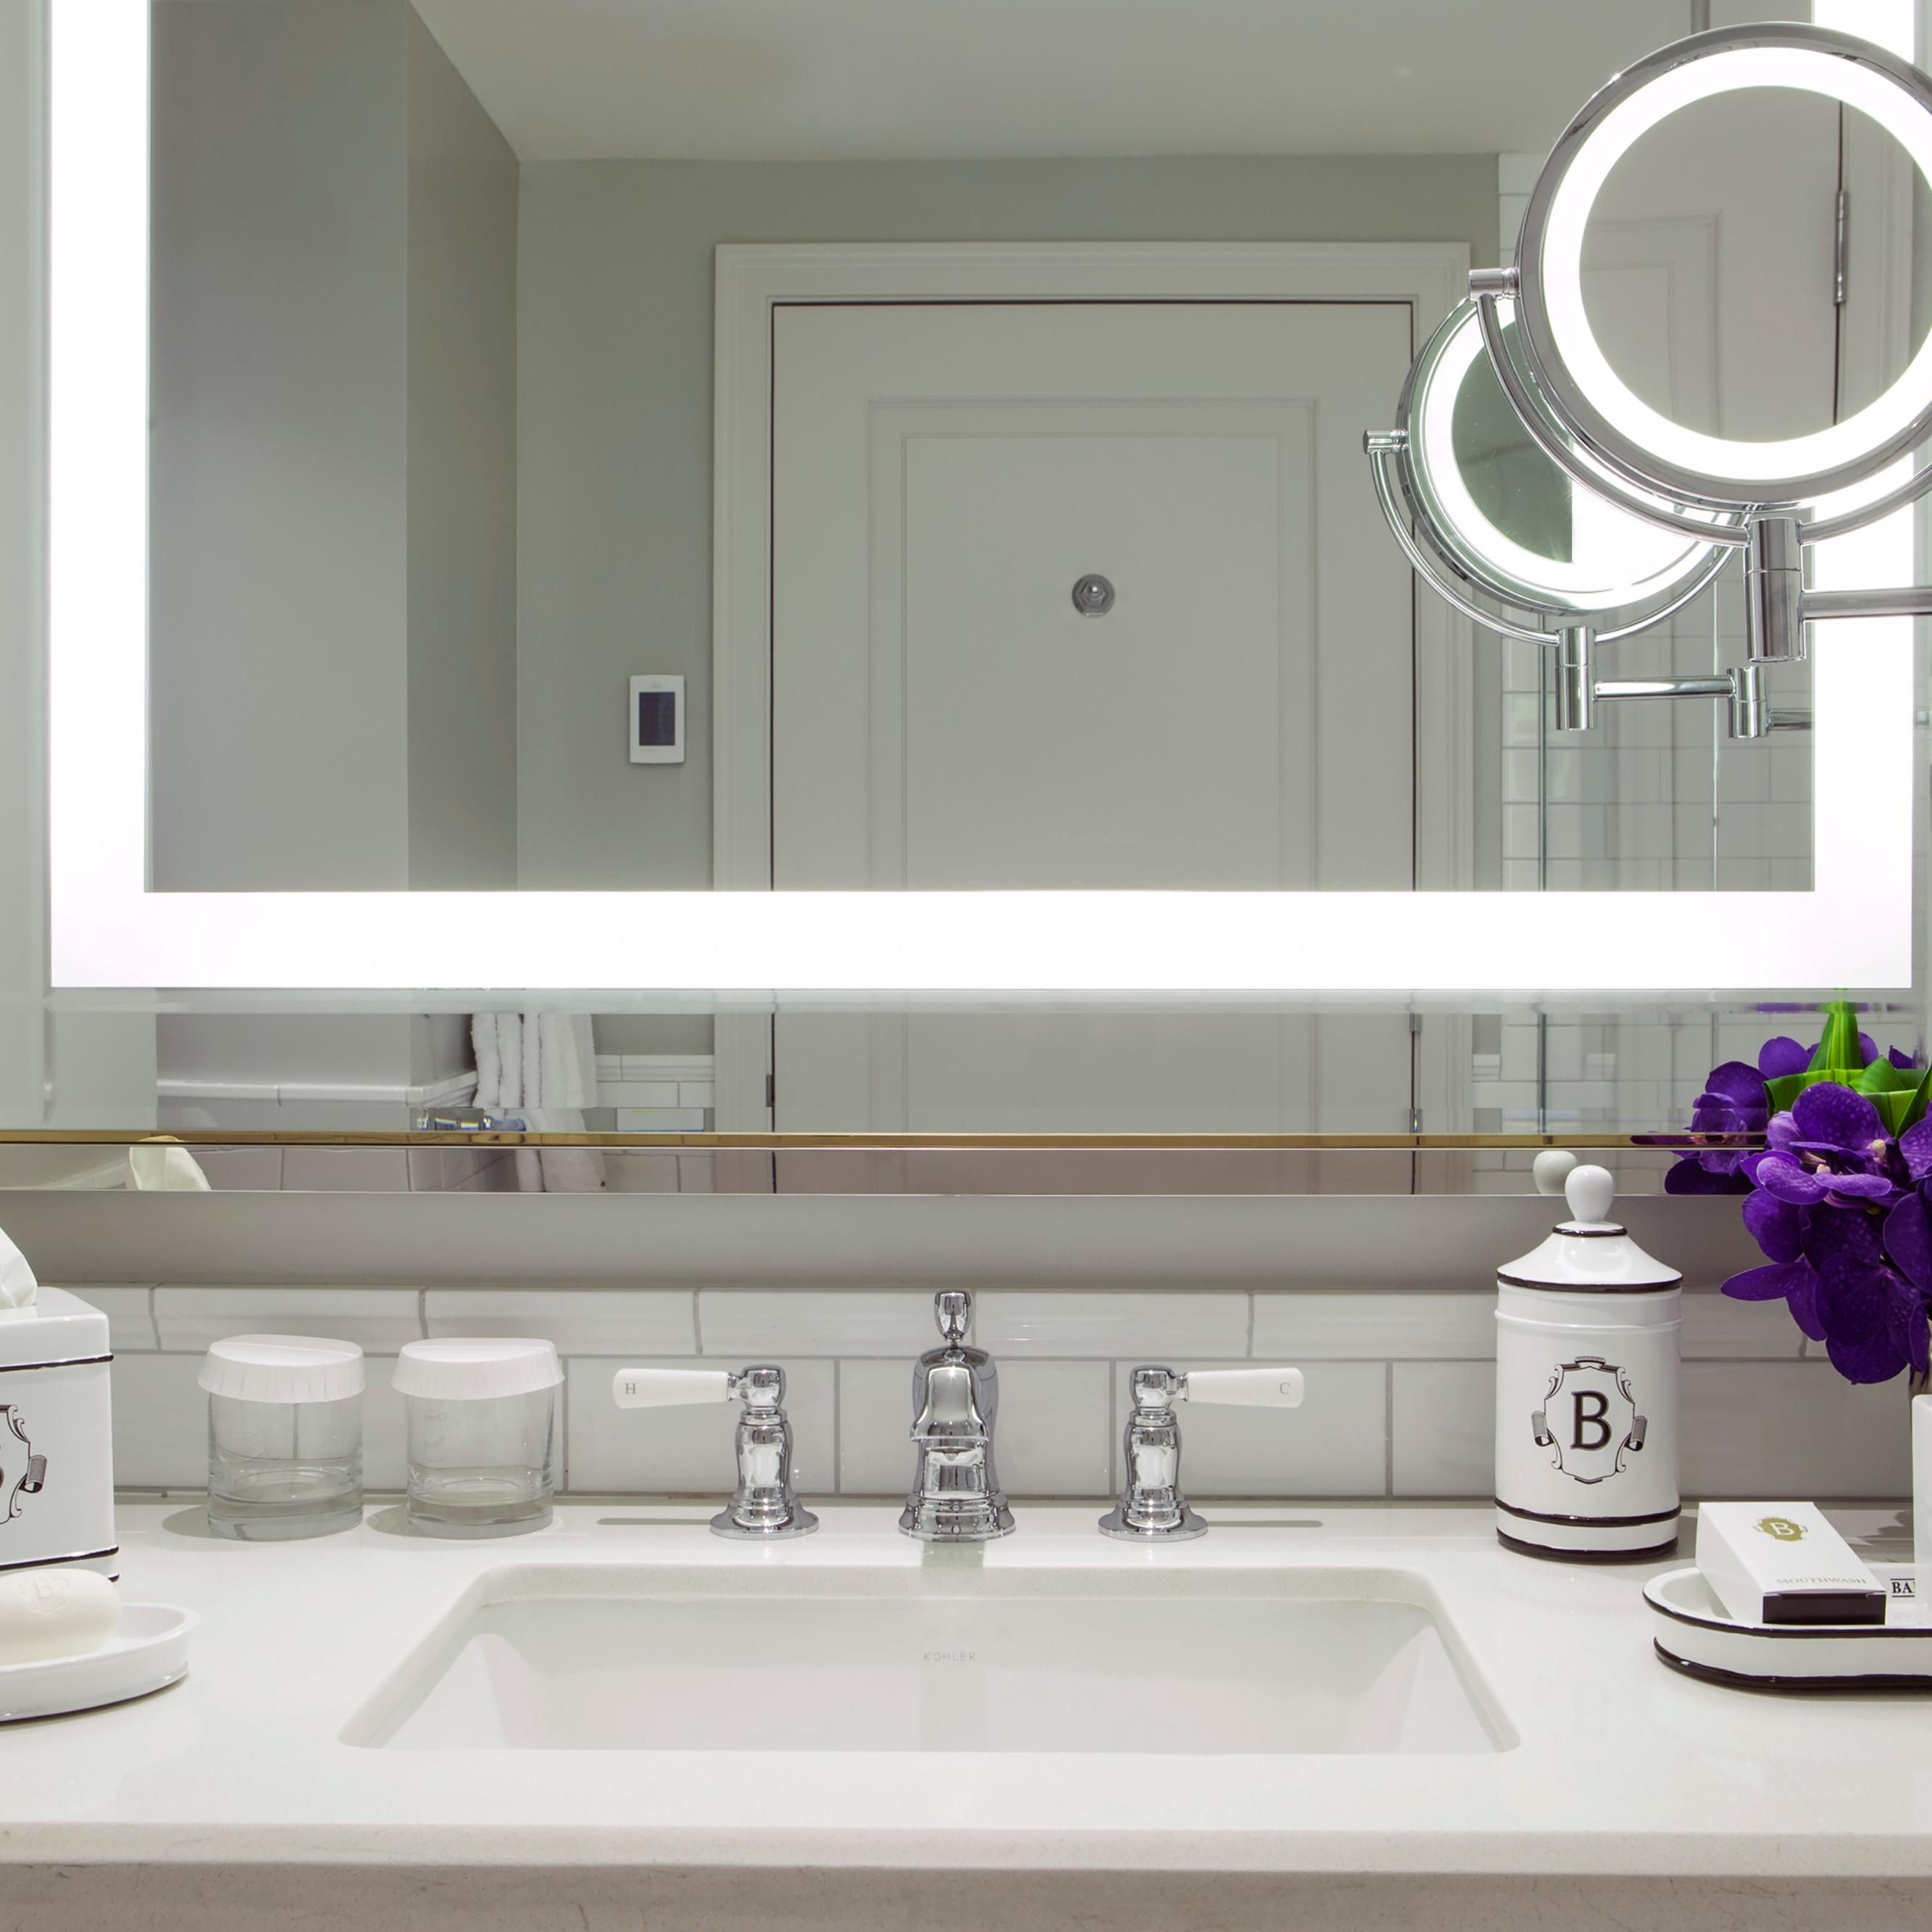 Bathroom Stall Em Portugues intercontinental new york barclay - new york new york